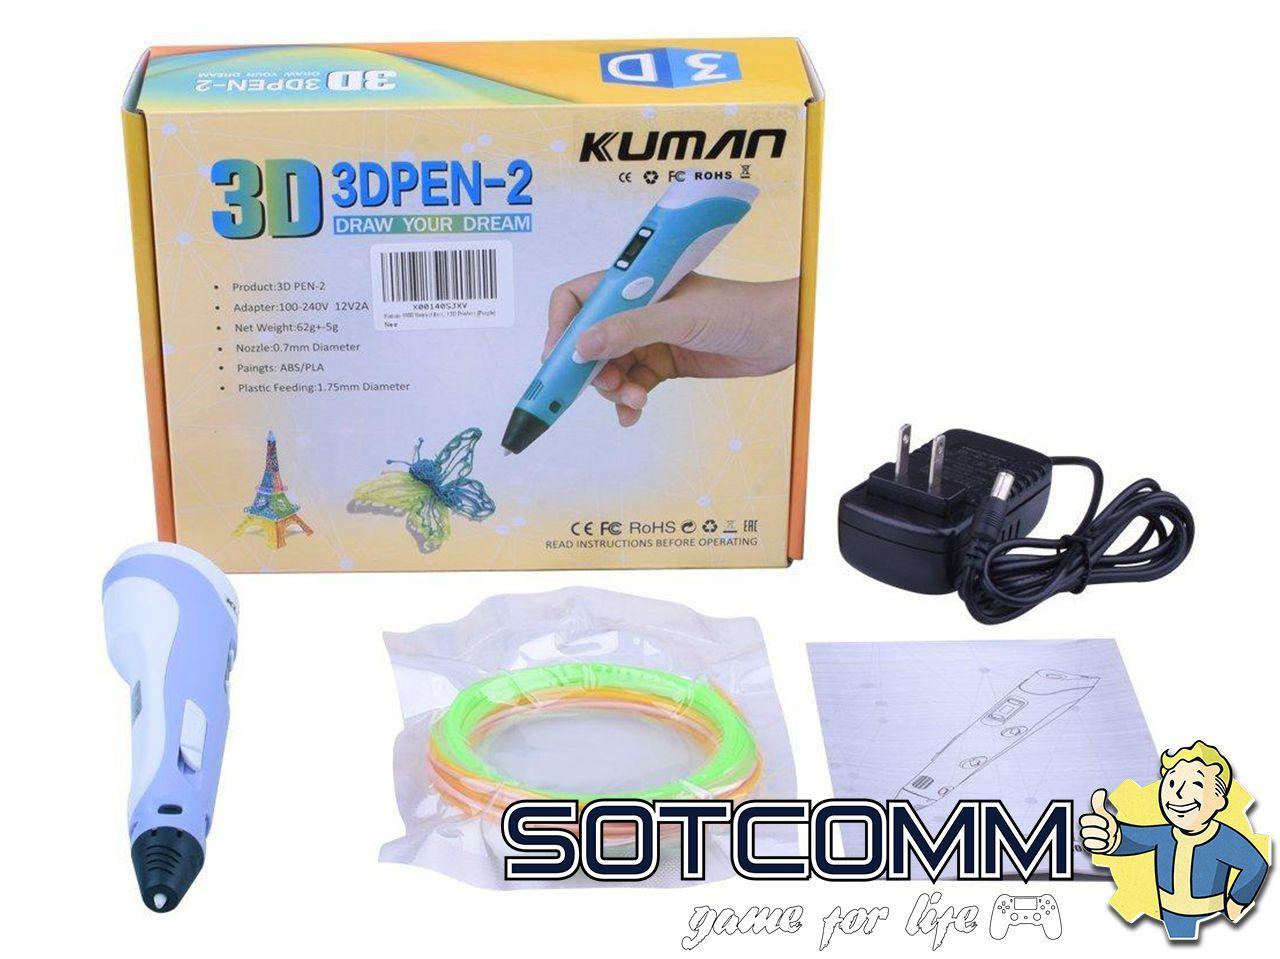 3D ручка 3DPen-2 с LCD дисплеем комплектация